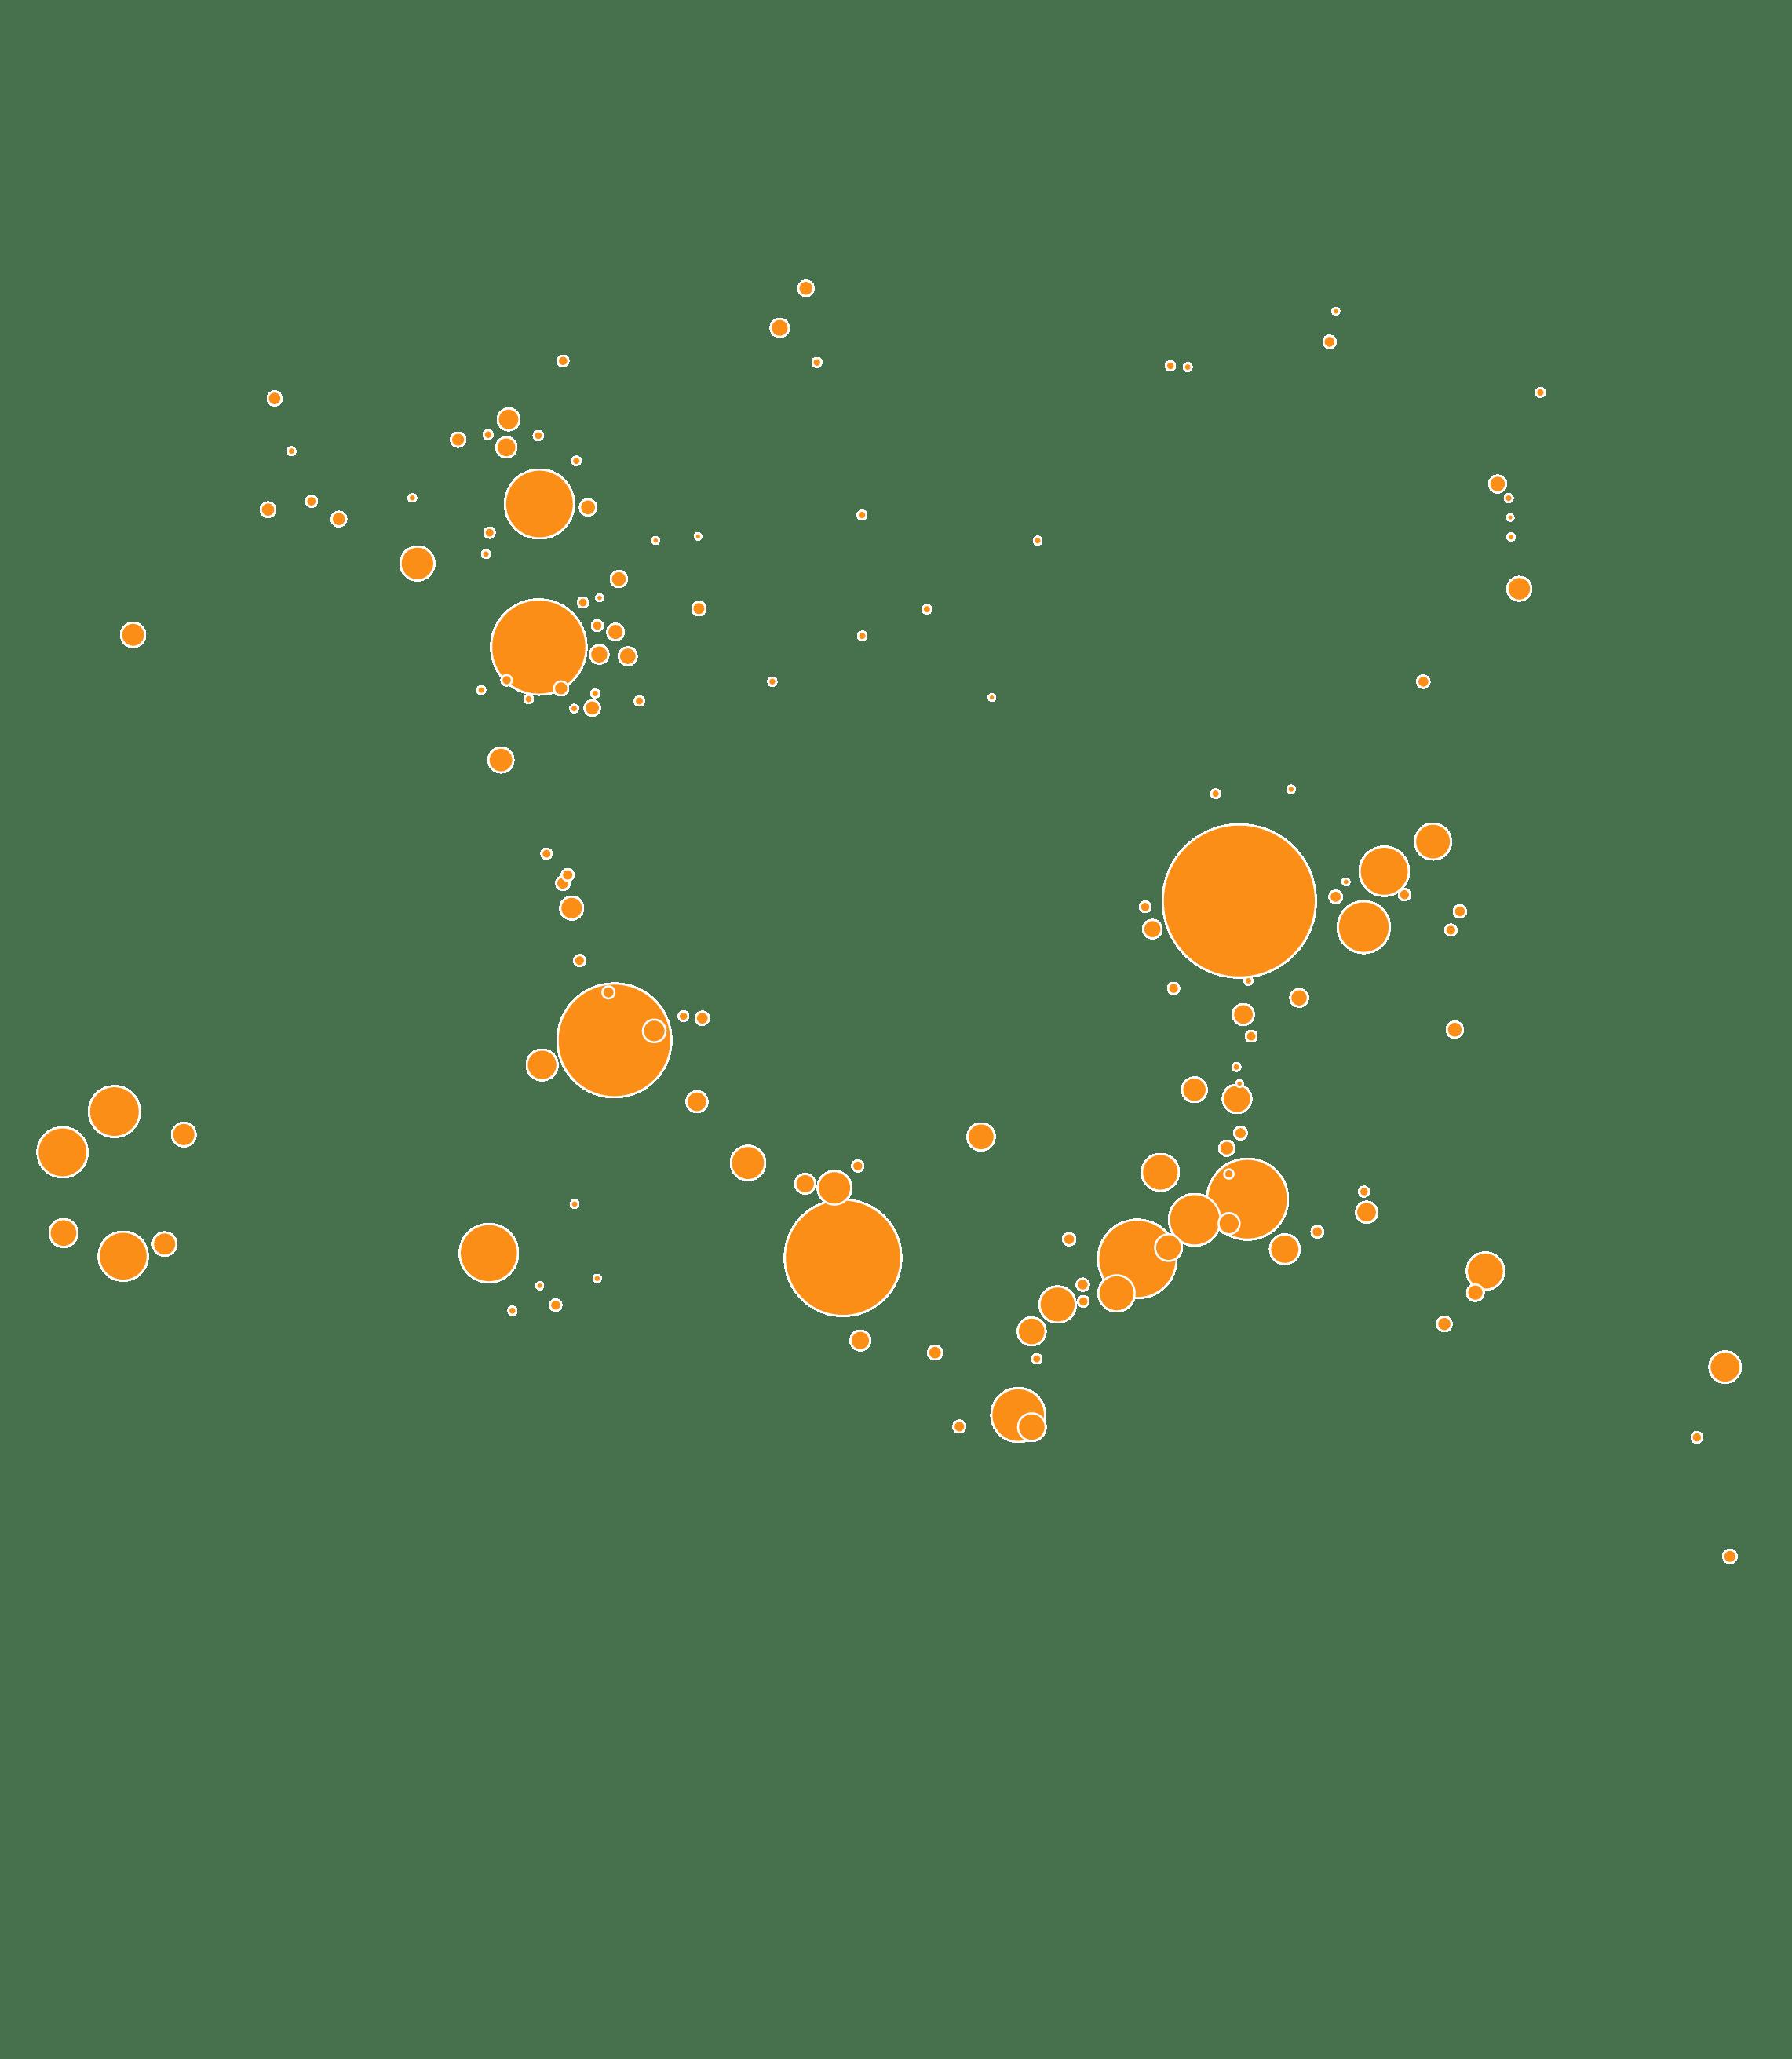 Aires urbaines gagnant des habitants